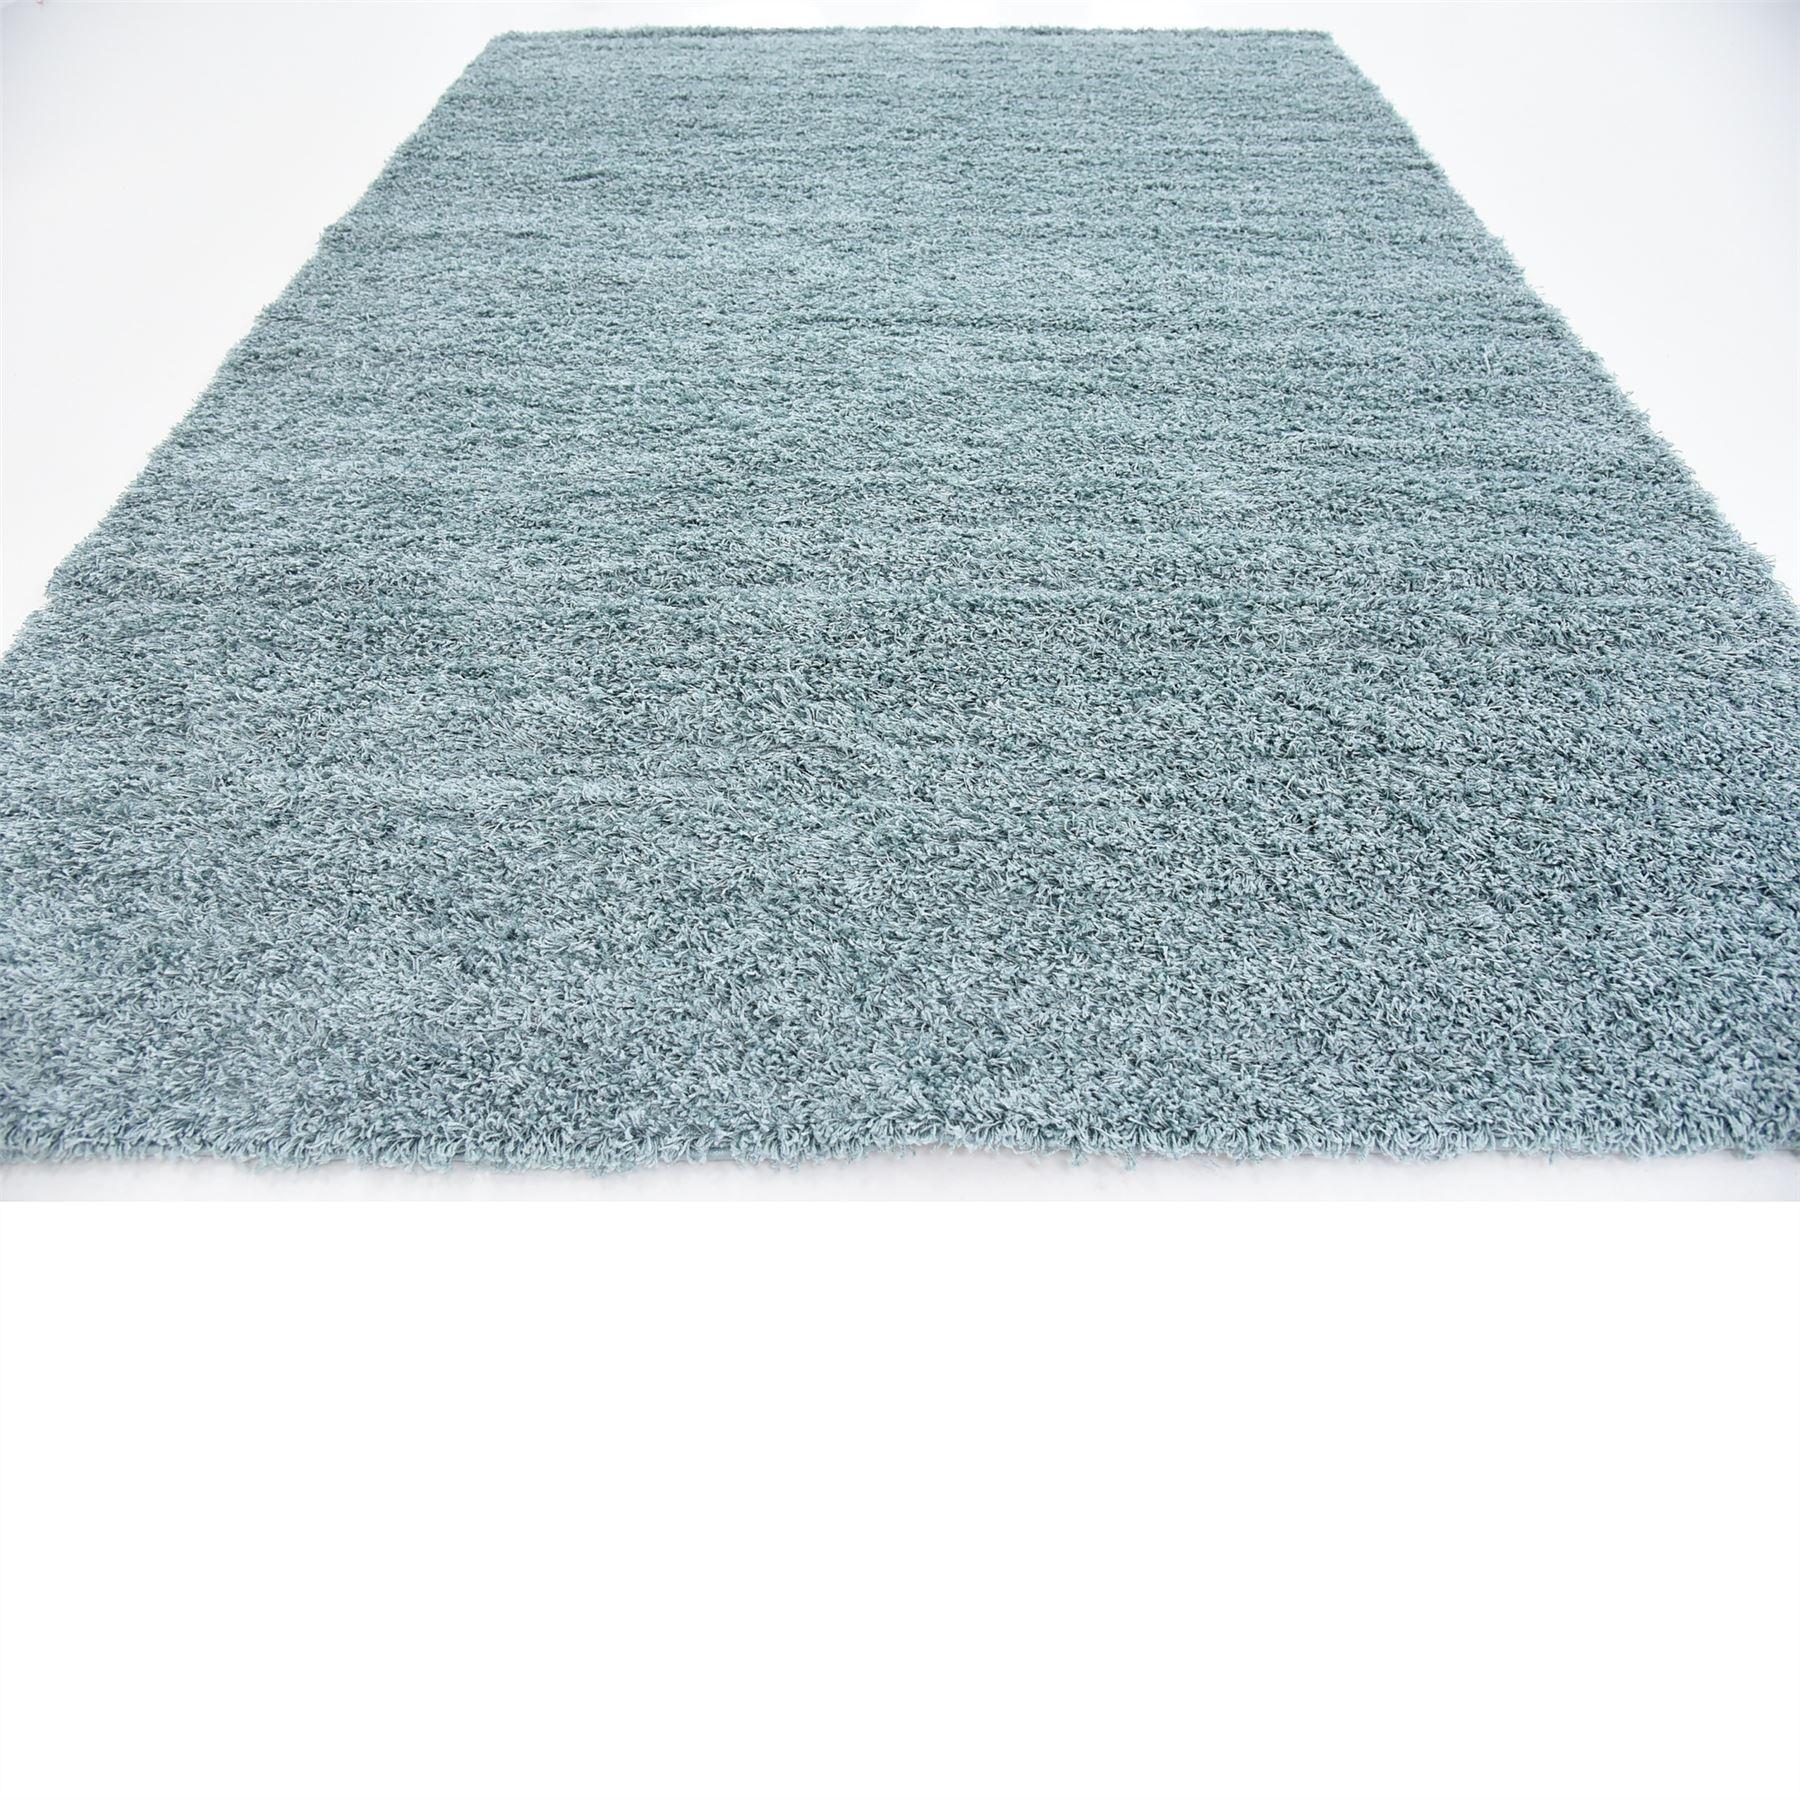 Light Slate Blue 8 X 10 11 Solid Shag Modern Floor